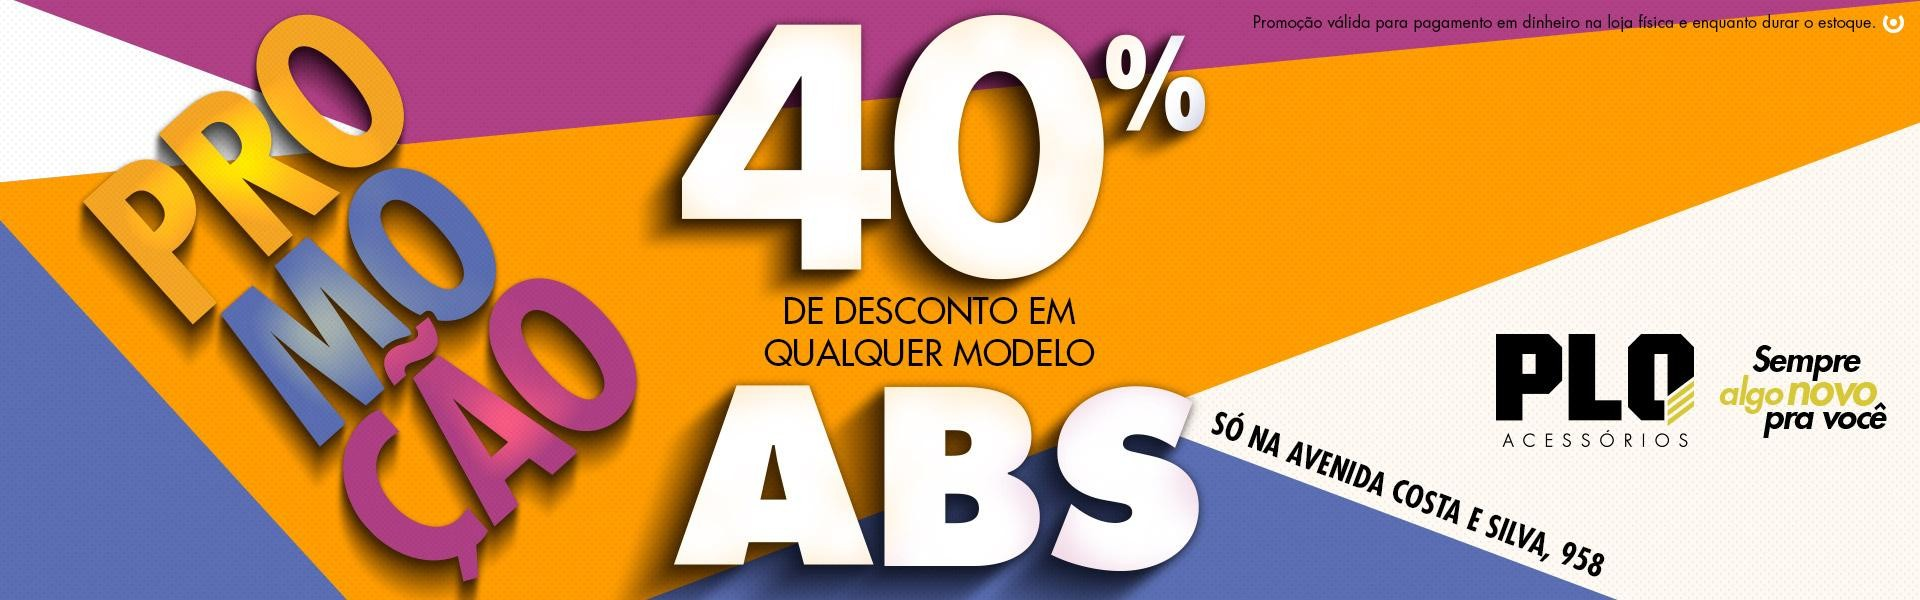 PROMO 40% ABS